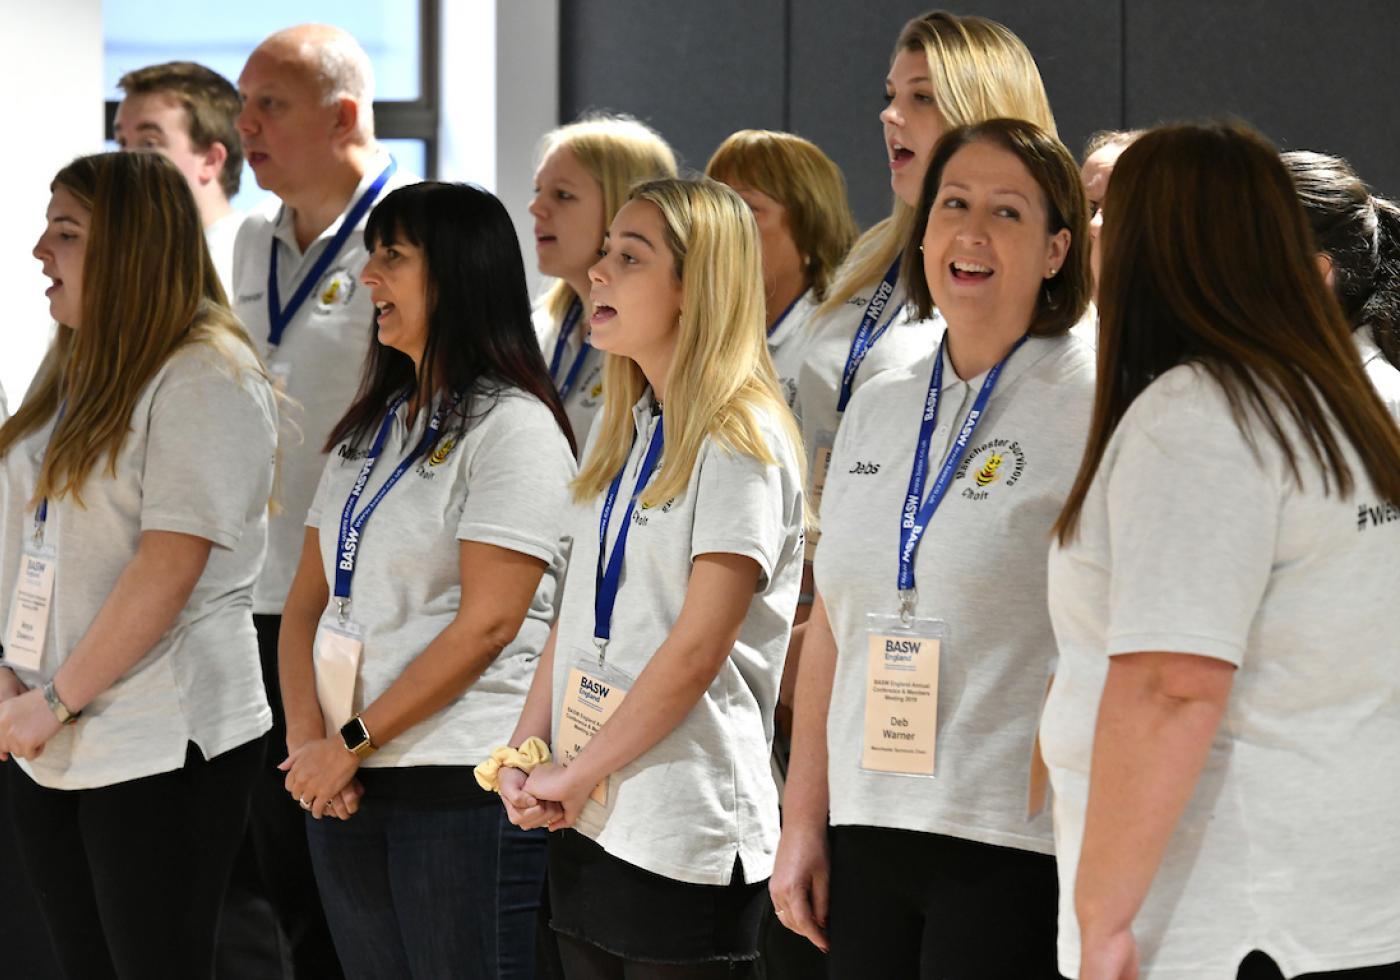 Manchester Survivors Choir